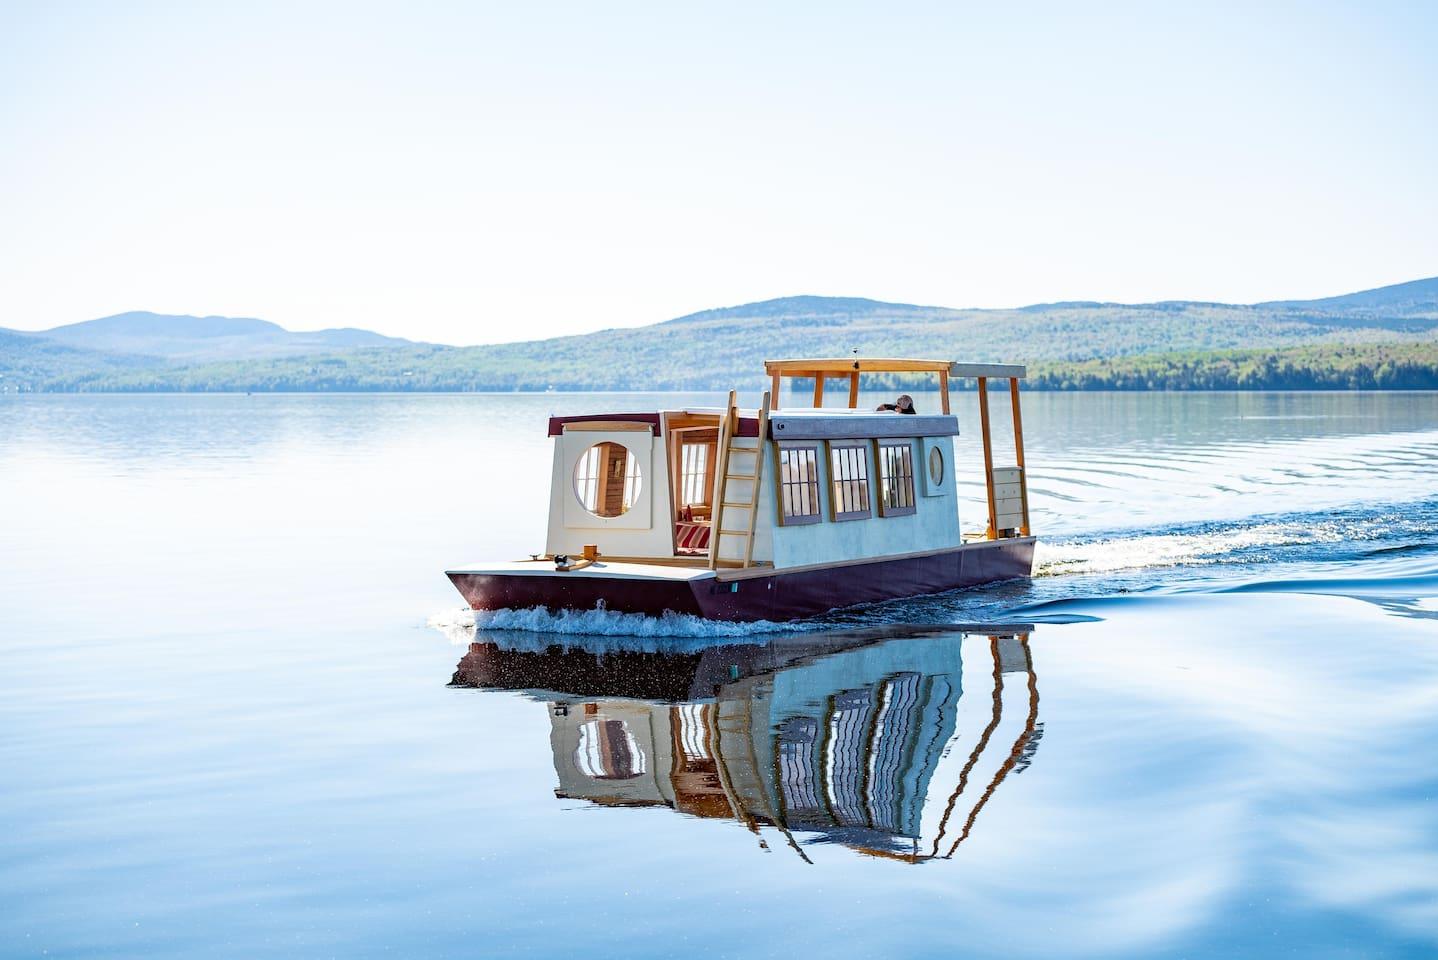 Floating Camp Roam on Rangeley Lake